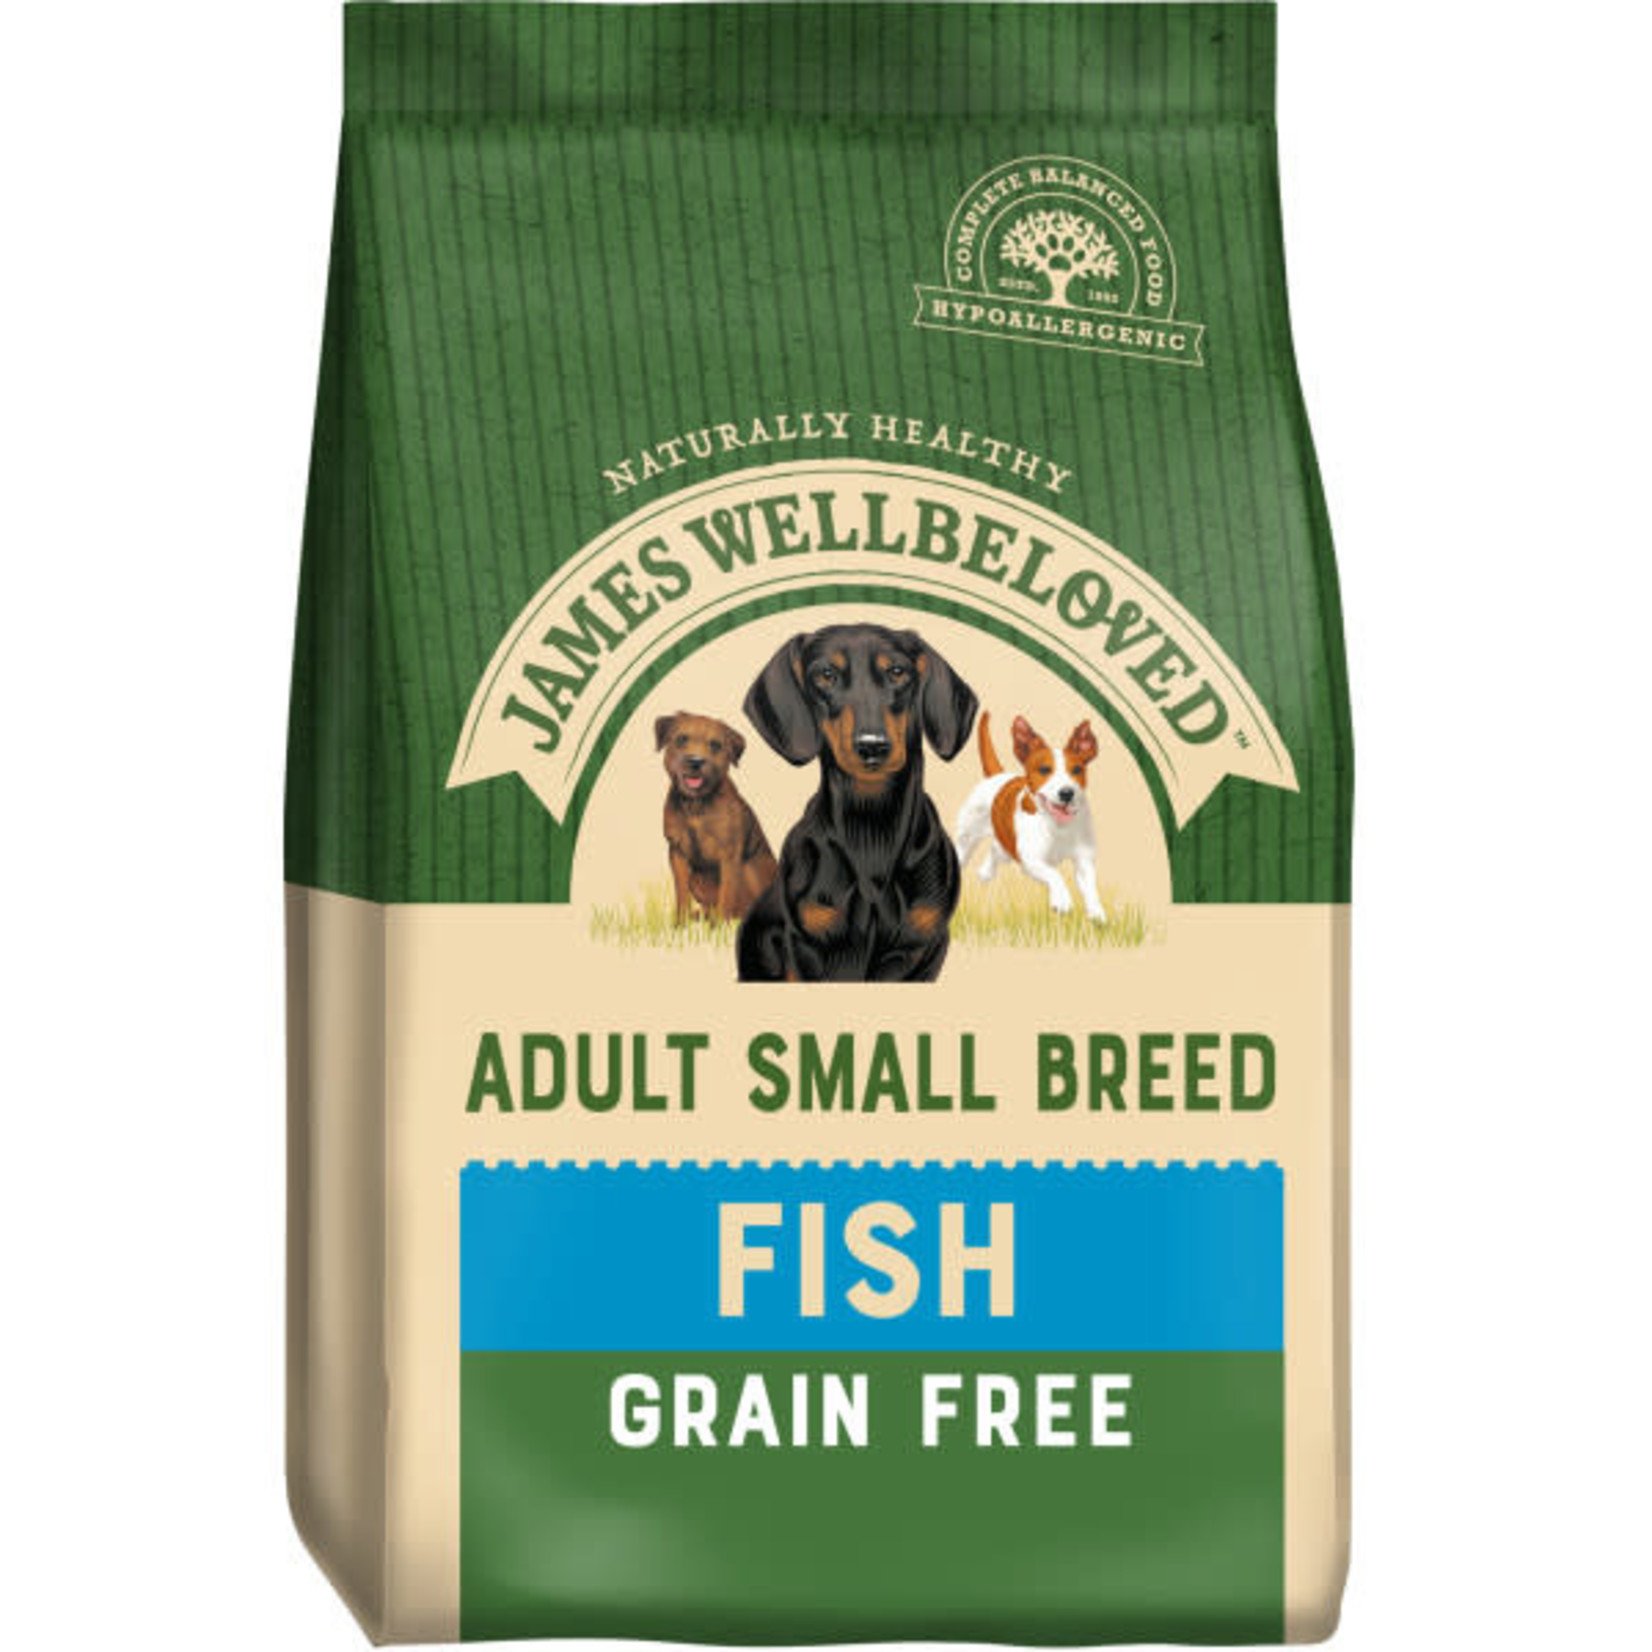 James Wellbeloved Grain Free Small Breed Adult Dog Dry Food, Fish & Vegetable, 1.5kg